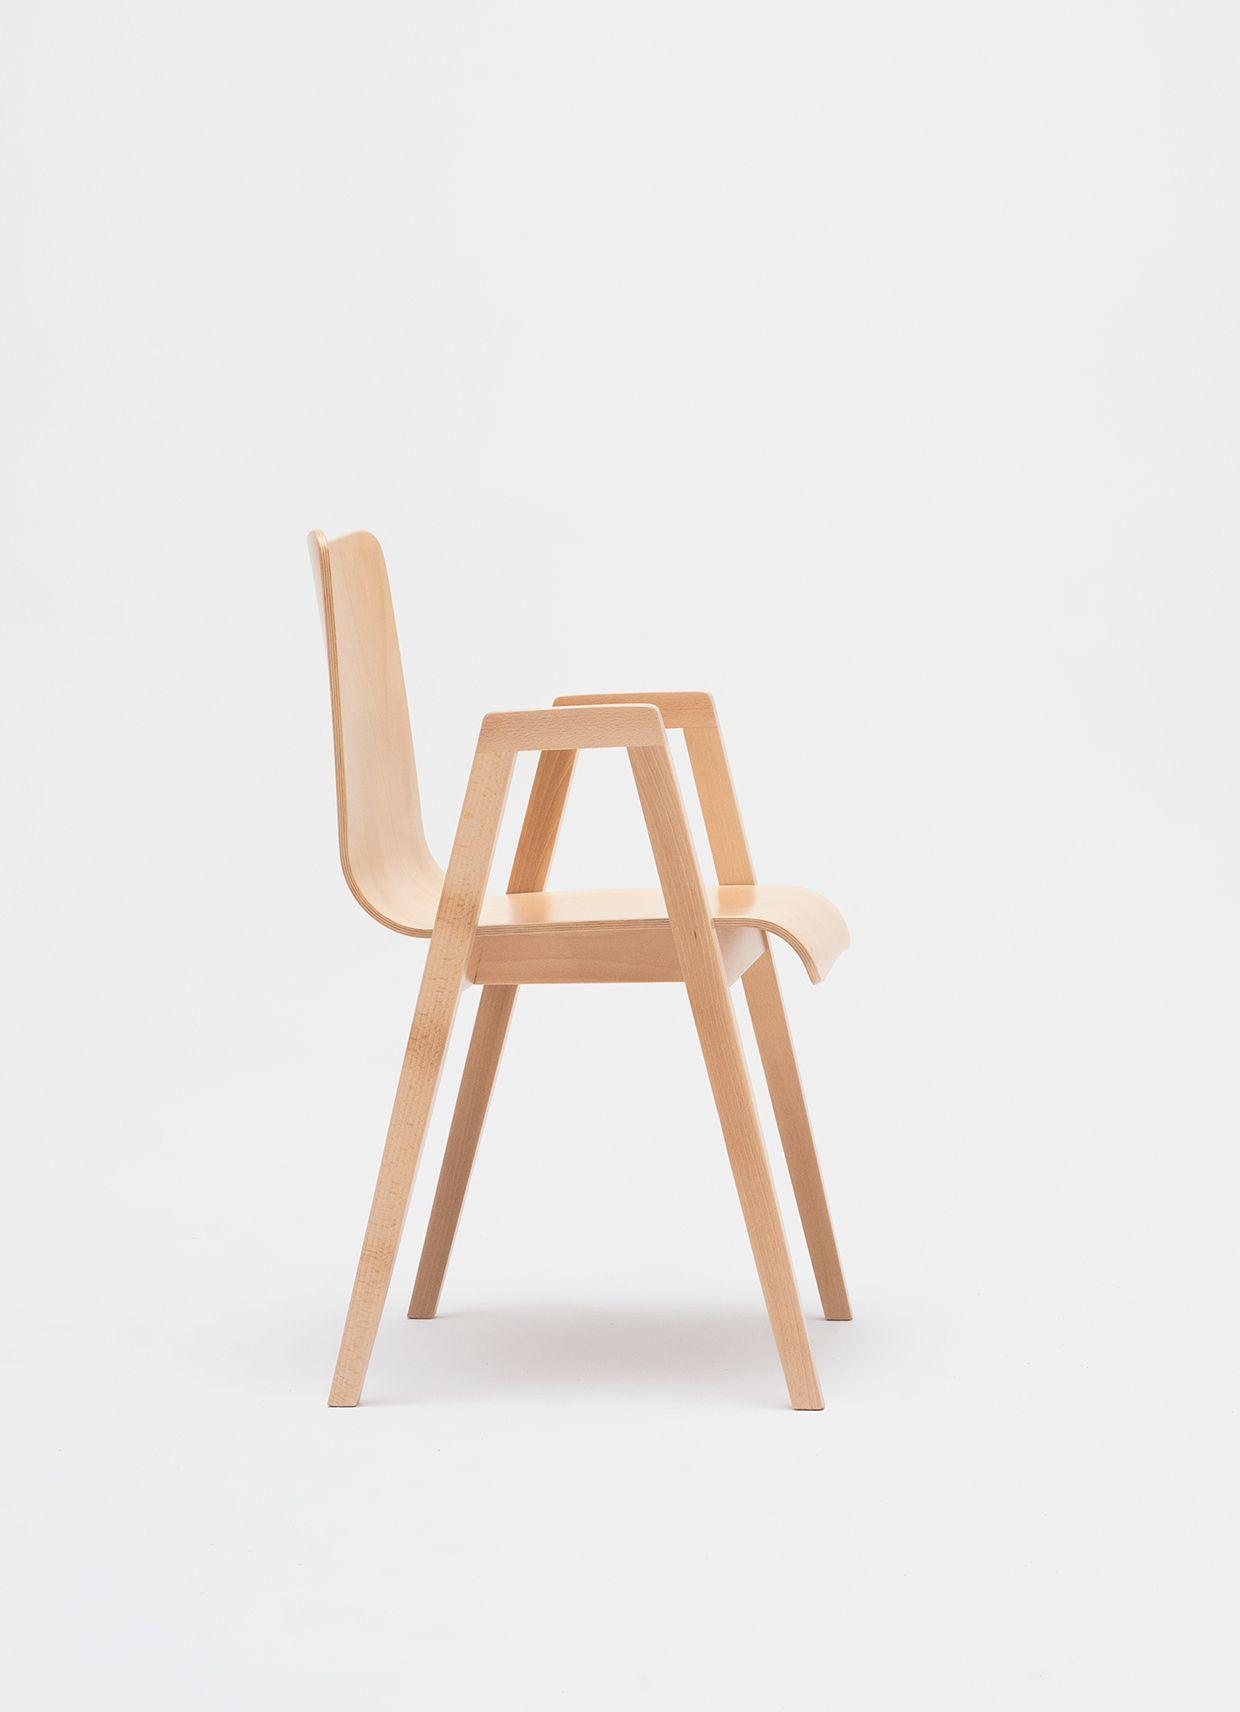 wood-chair